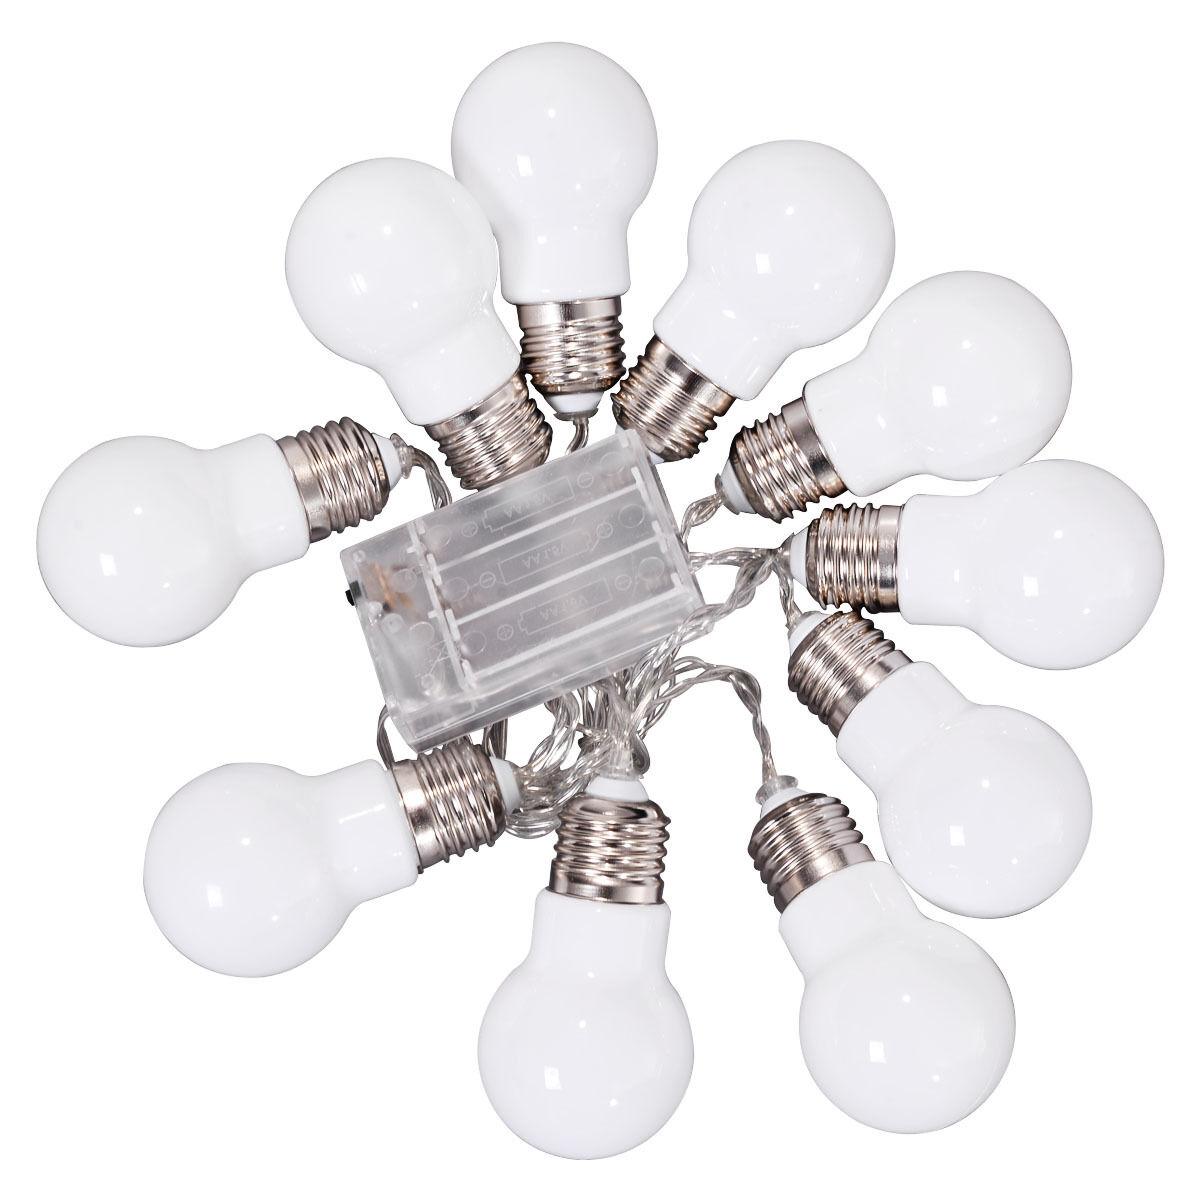 Christmas-LED-String-Ball-Lights-Xmas-Wedding-Party-Decor-Fairy-Lamp-Warm-White thumbnail 14